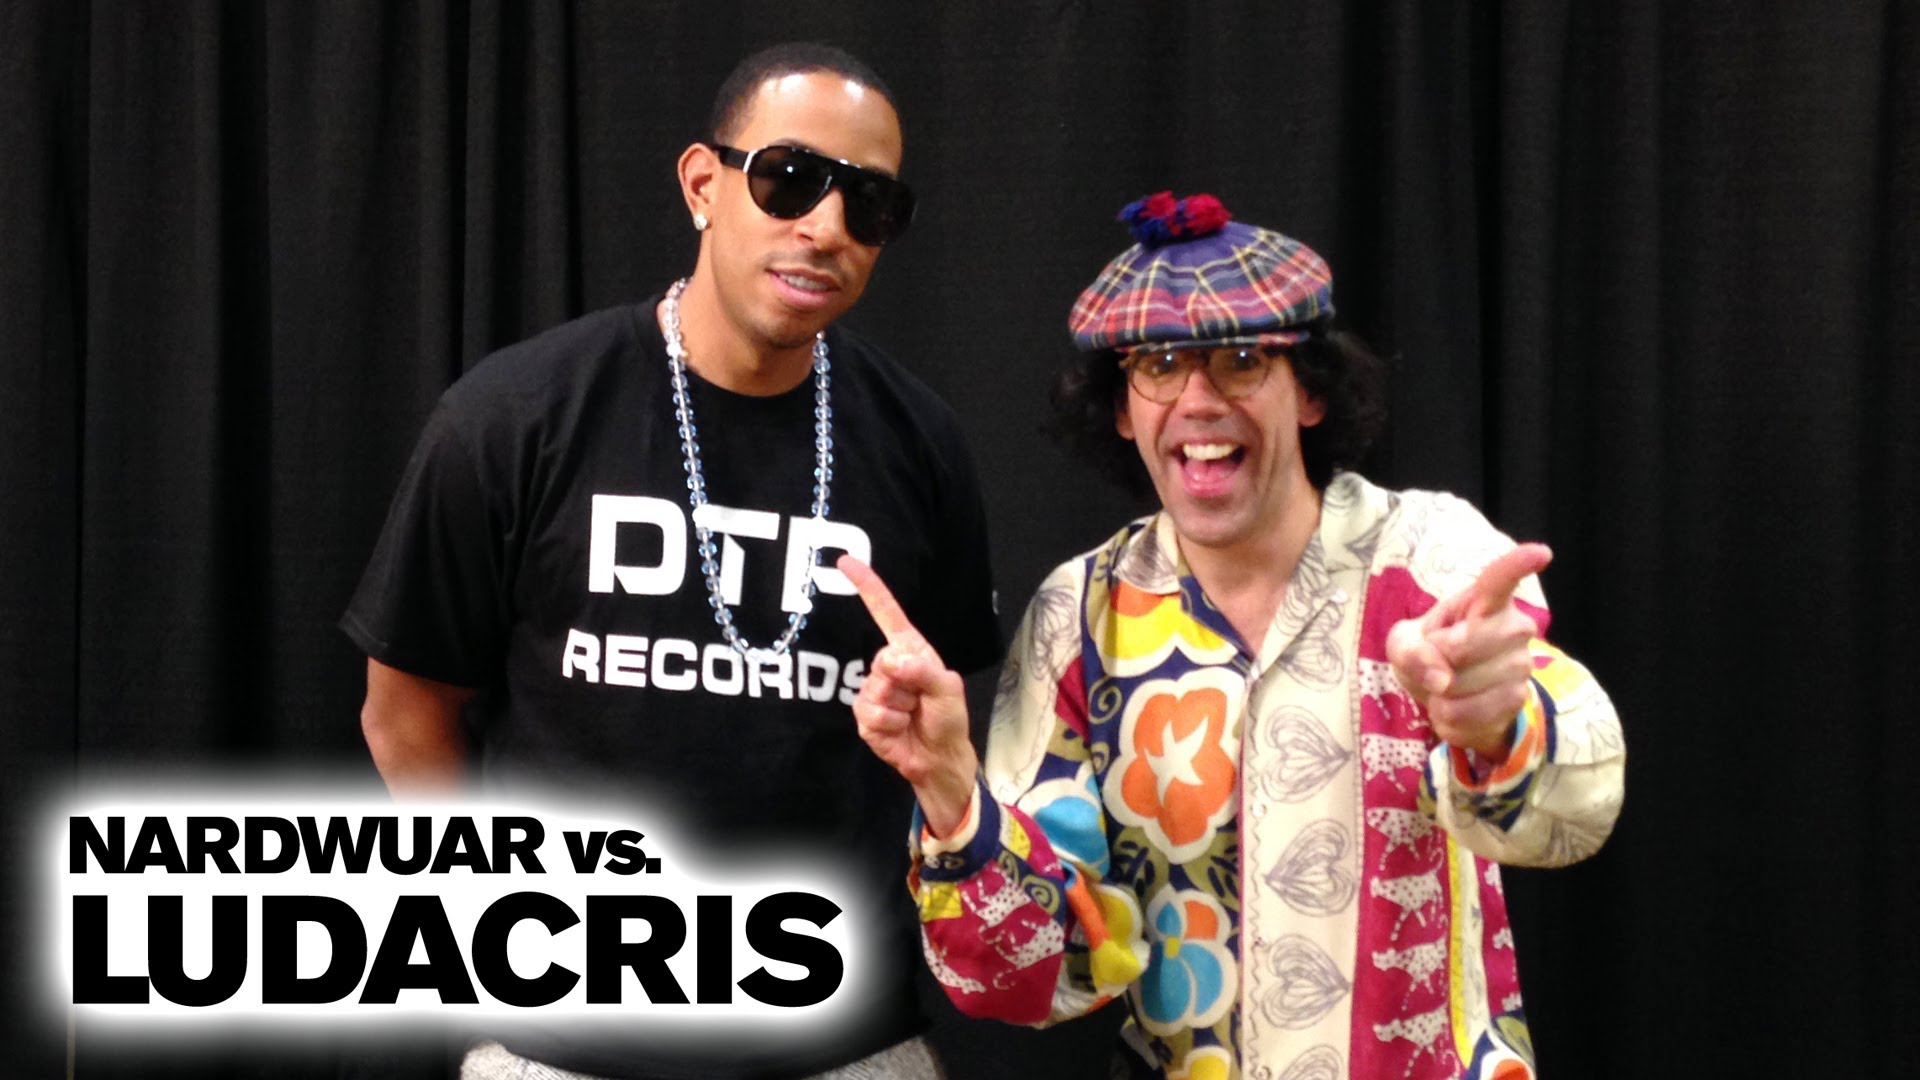 Nardwuar vs. Ludacris